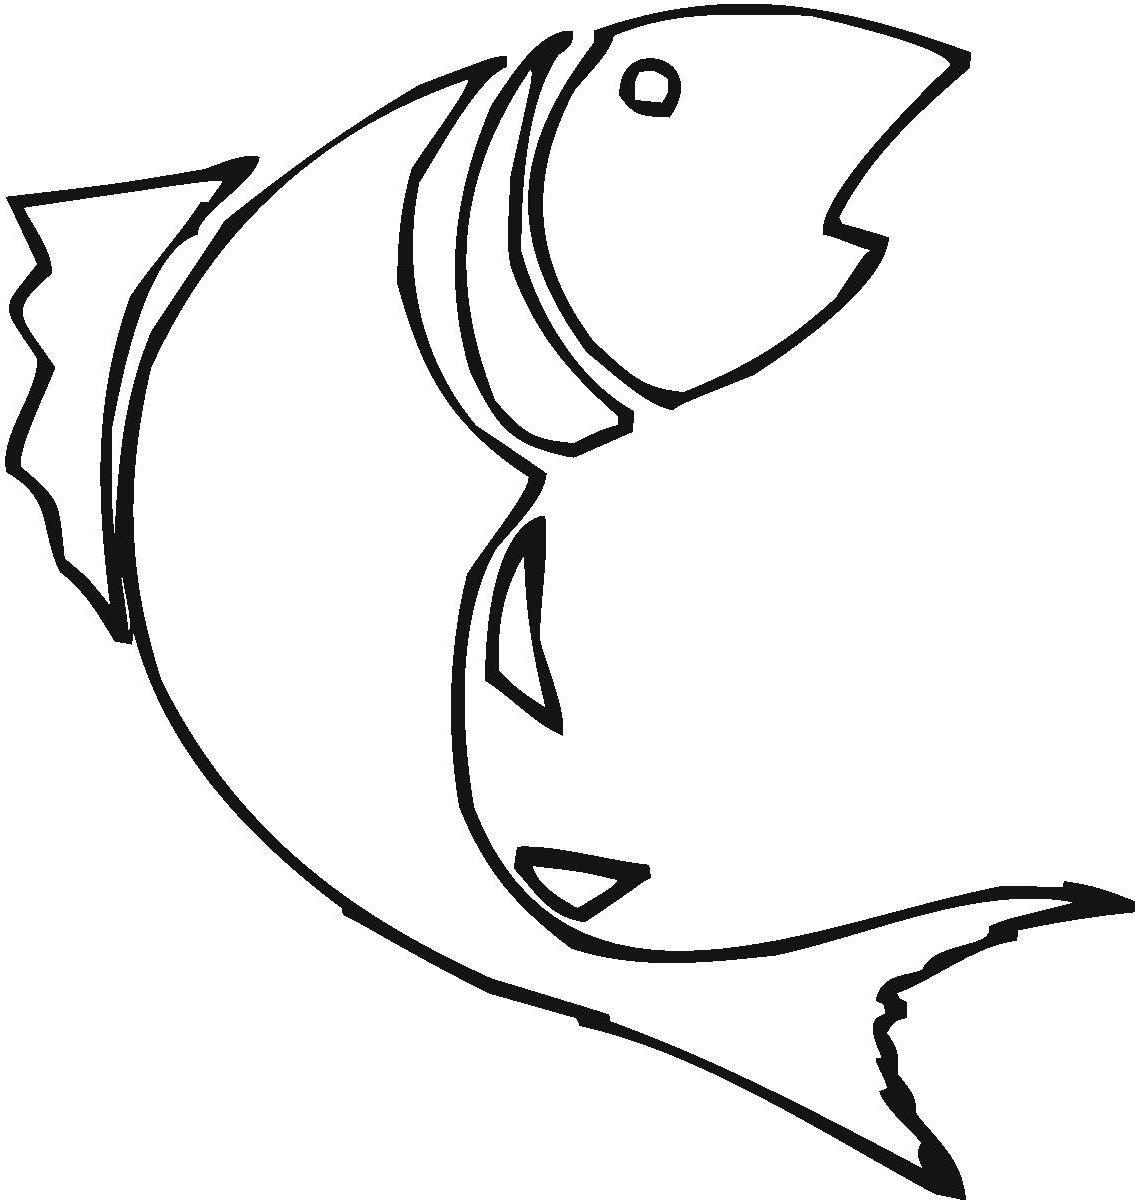 hight resolution of hd bass fish outline clip art design